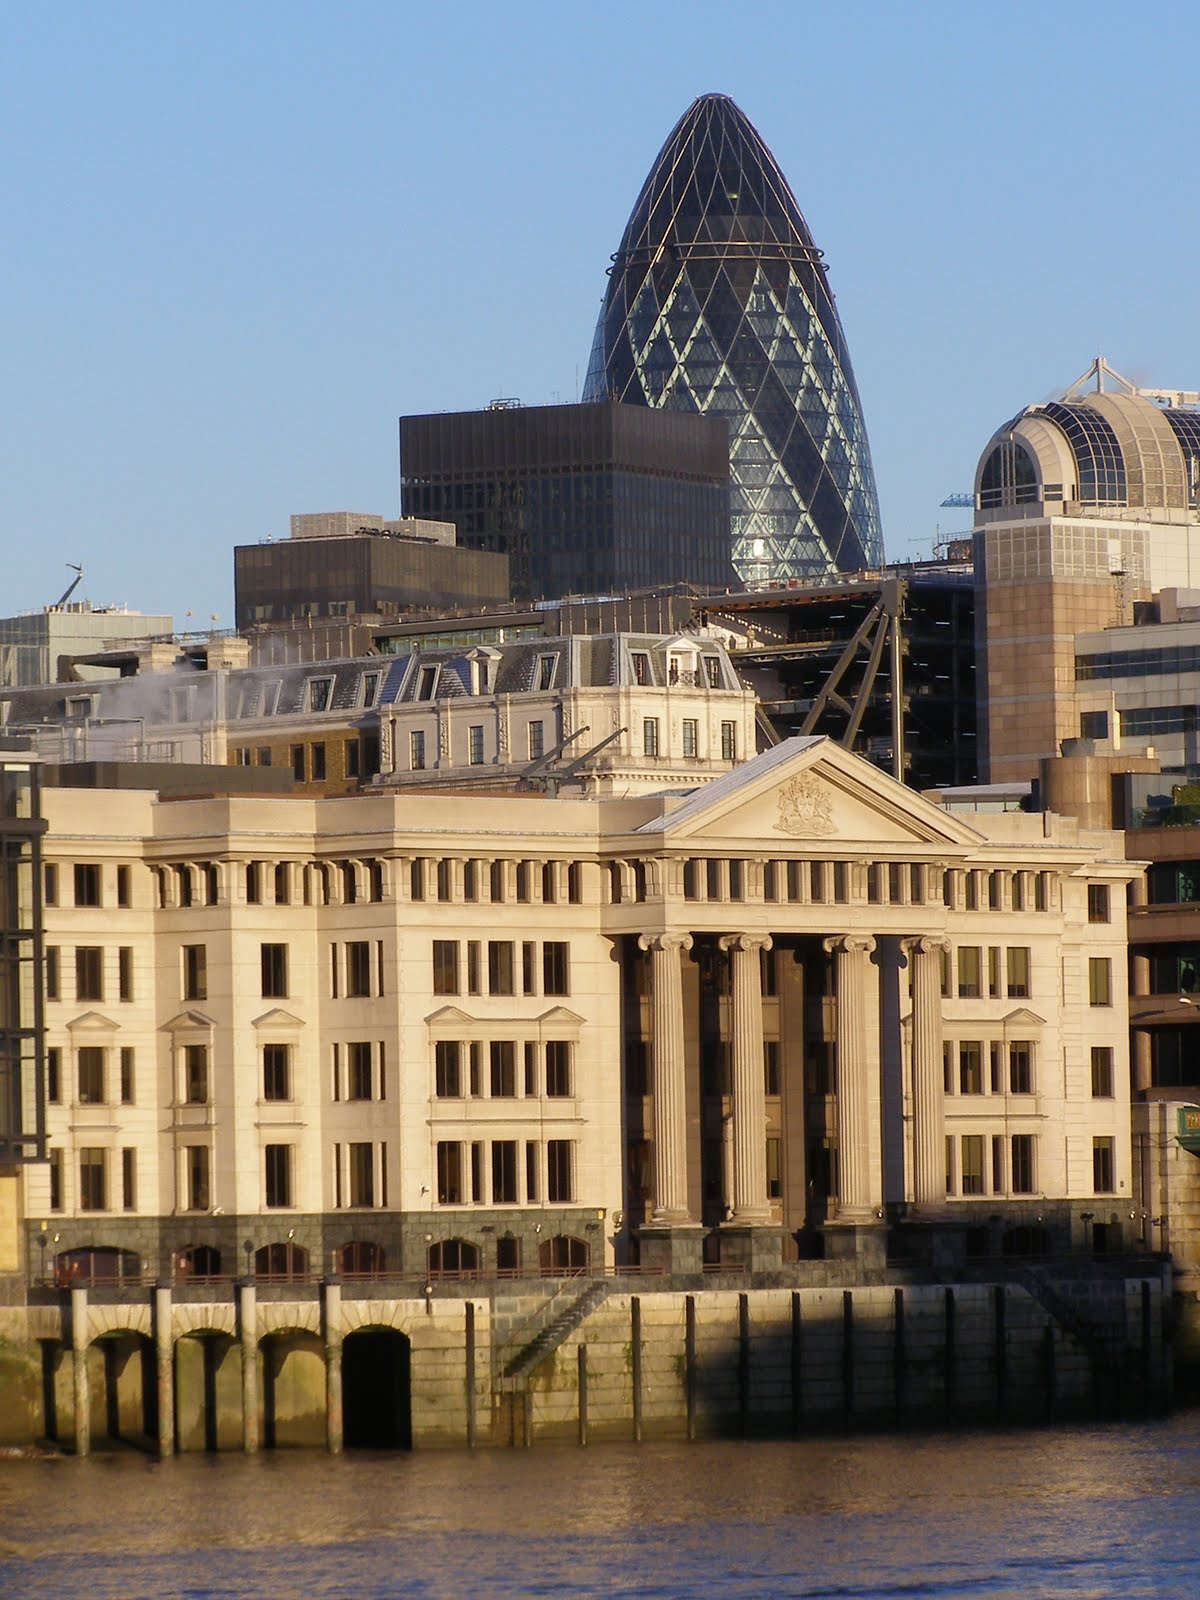 Photography novices names london buildings, quiz near london bridge